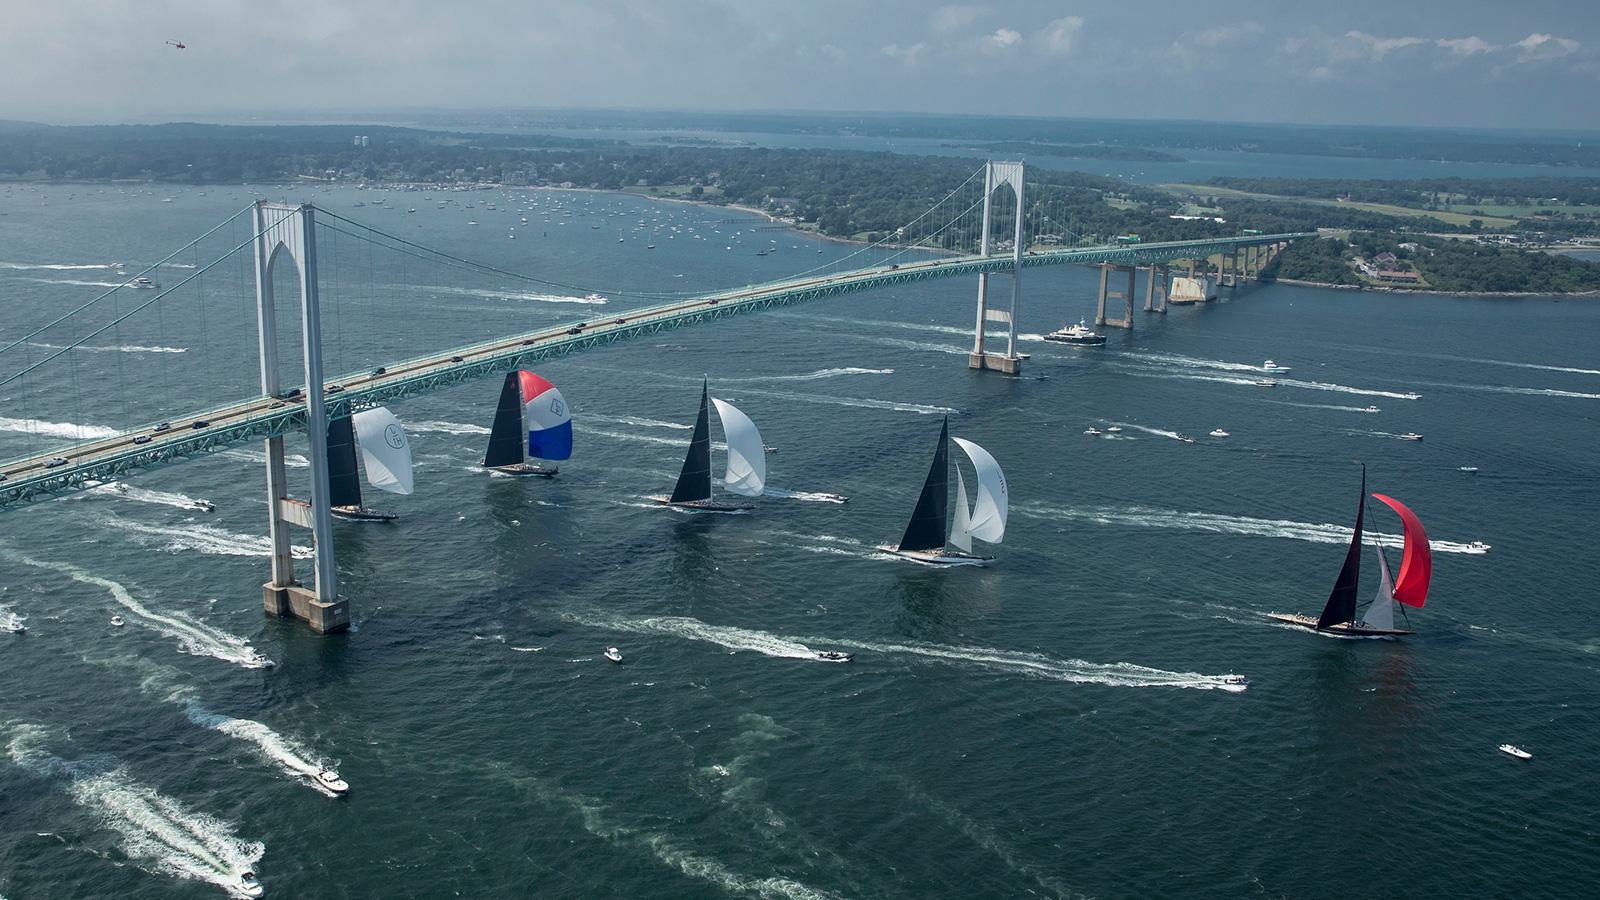 hanuman-won-day-one-of-the-inaugural-j-class-world-championships-classic-superyacht-regatta-credit-onne-van-der-wal